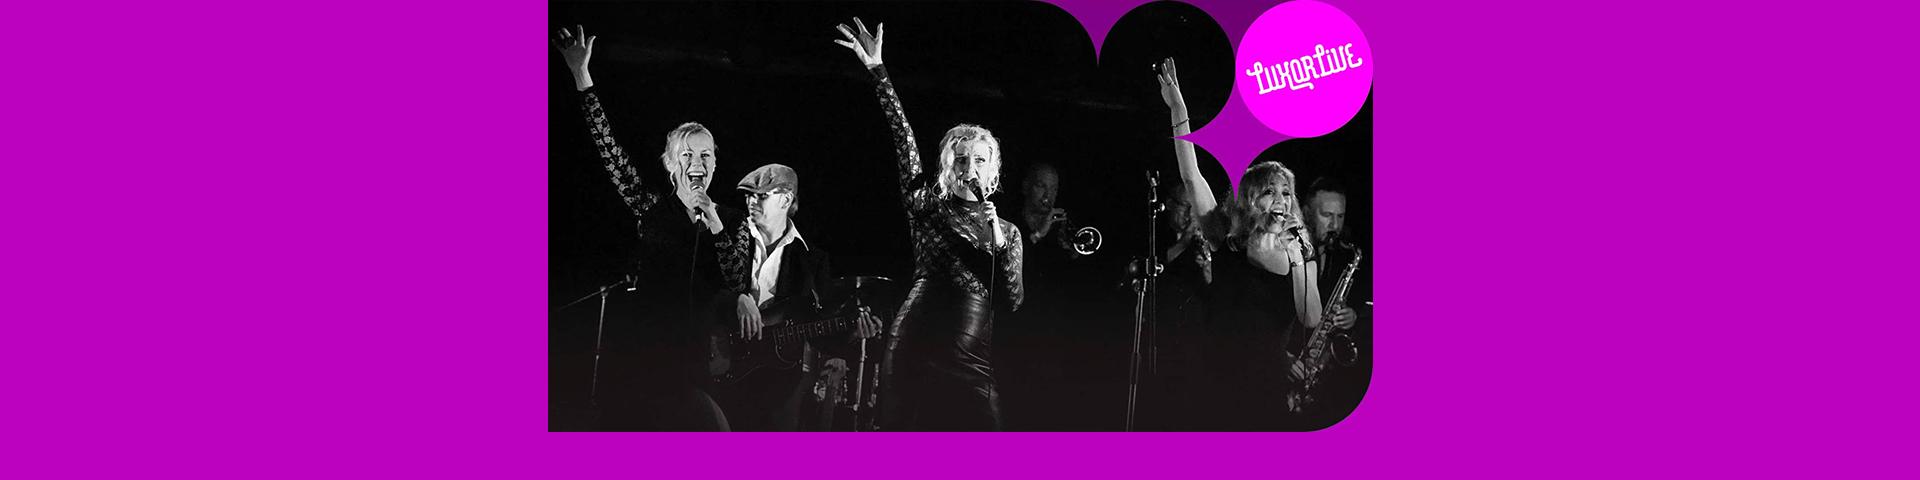 Etta James Experience in Luxor Live